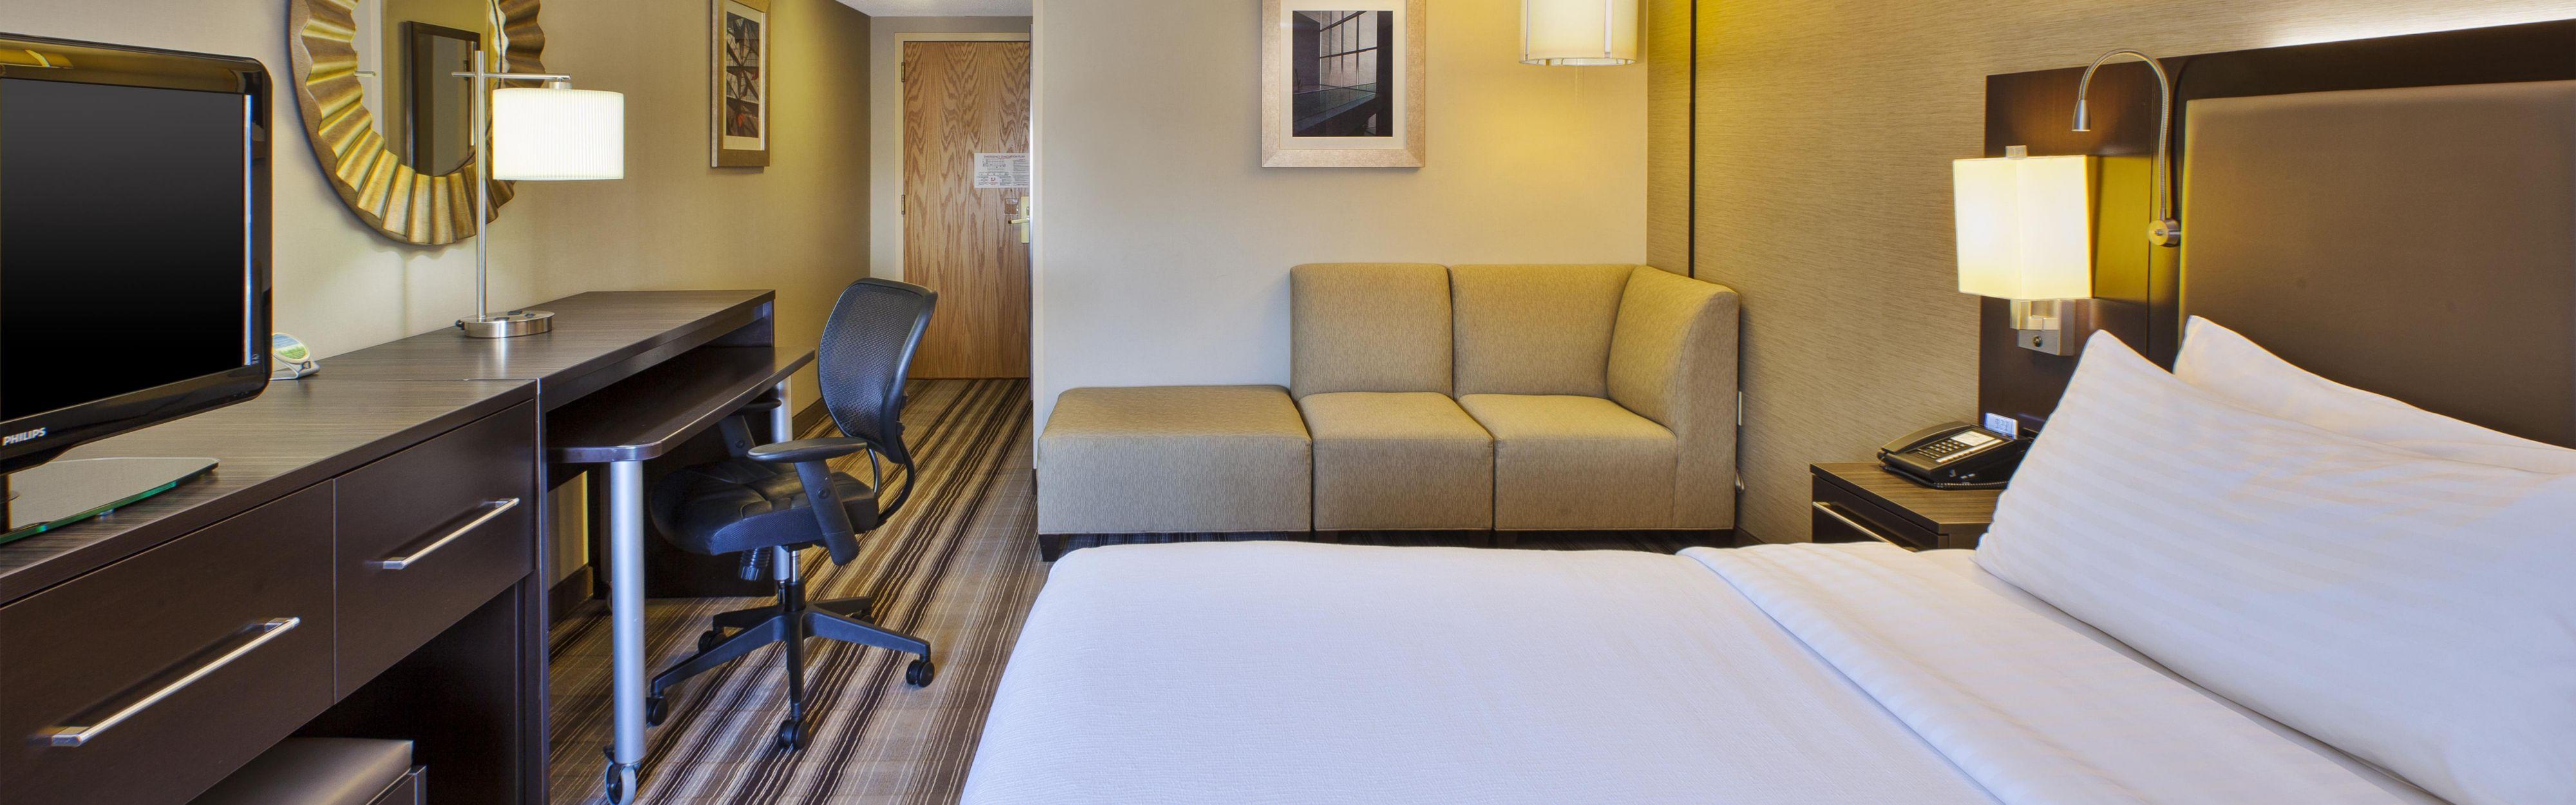 Holiday Inn Gaithersburg Gaithersburg Maryland Md